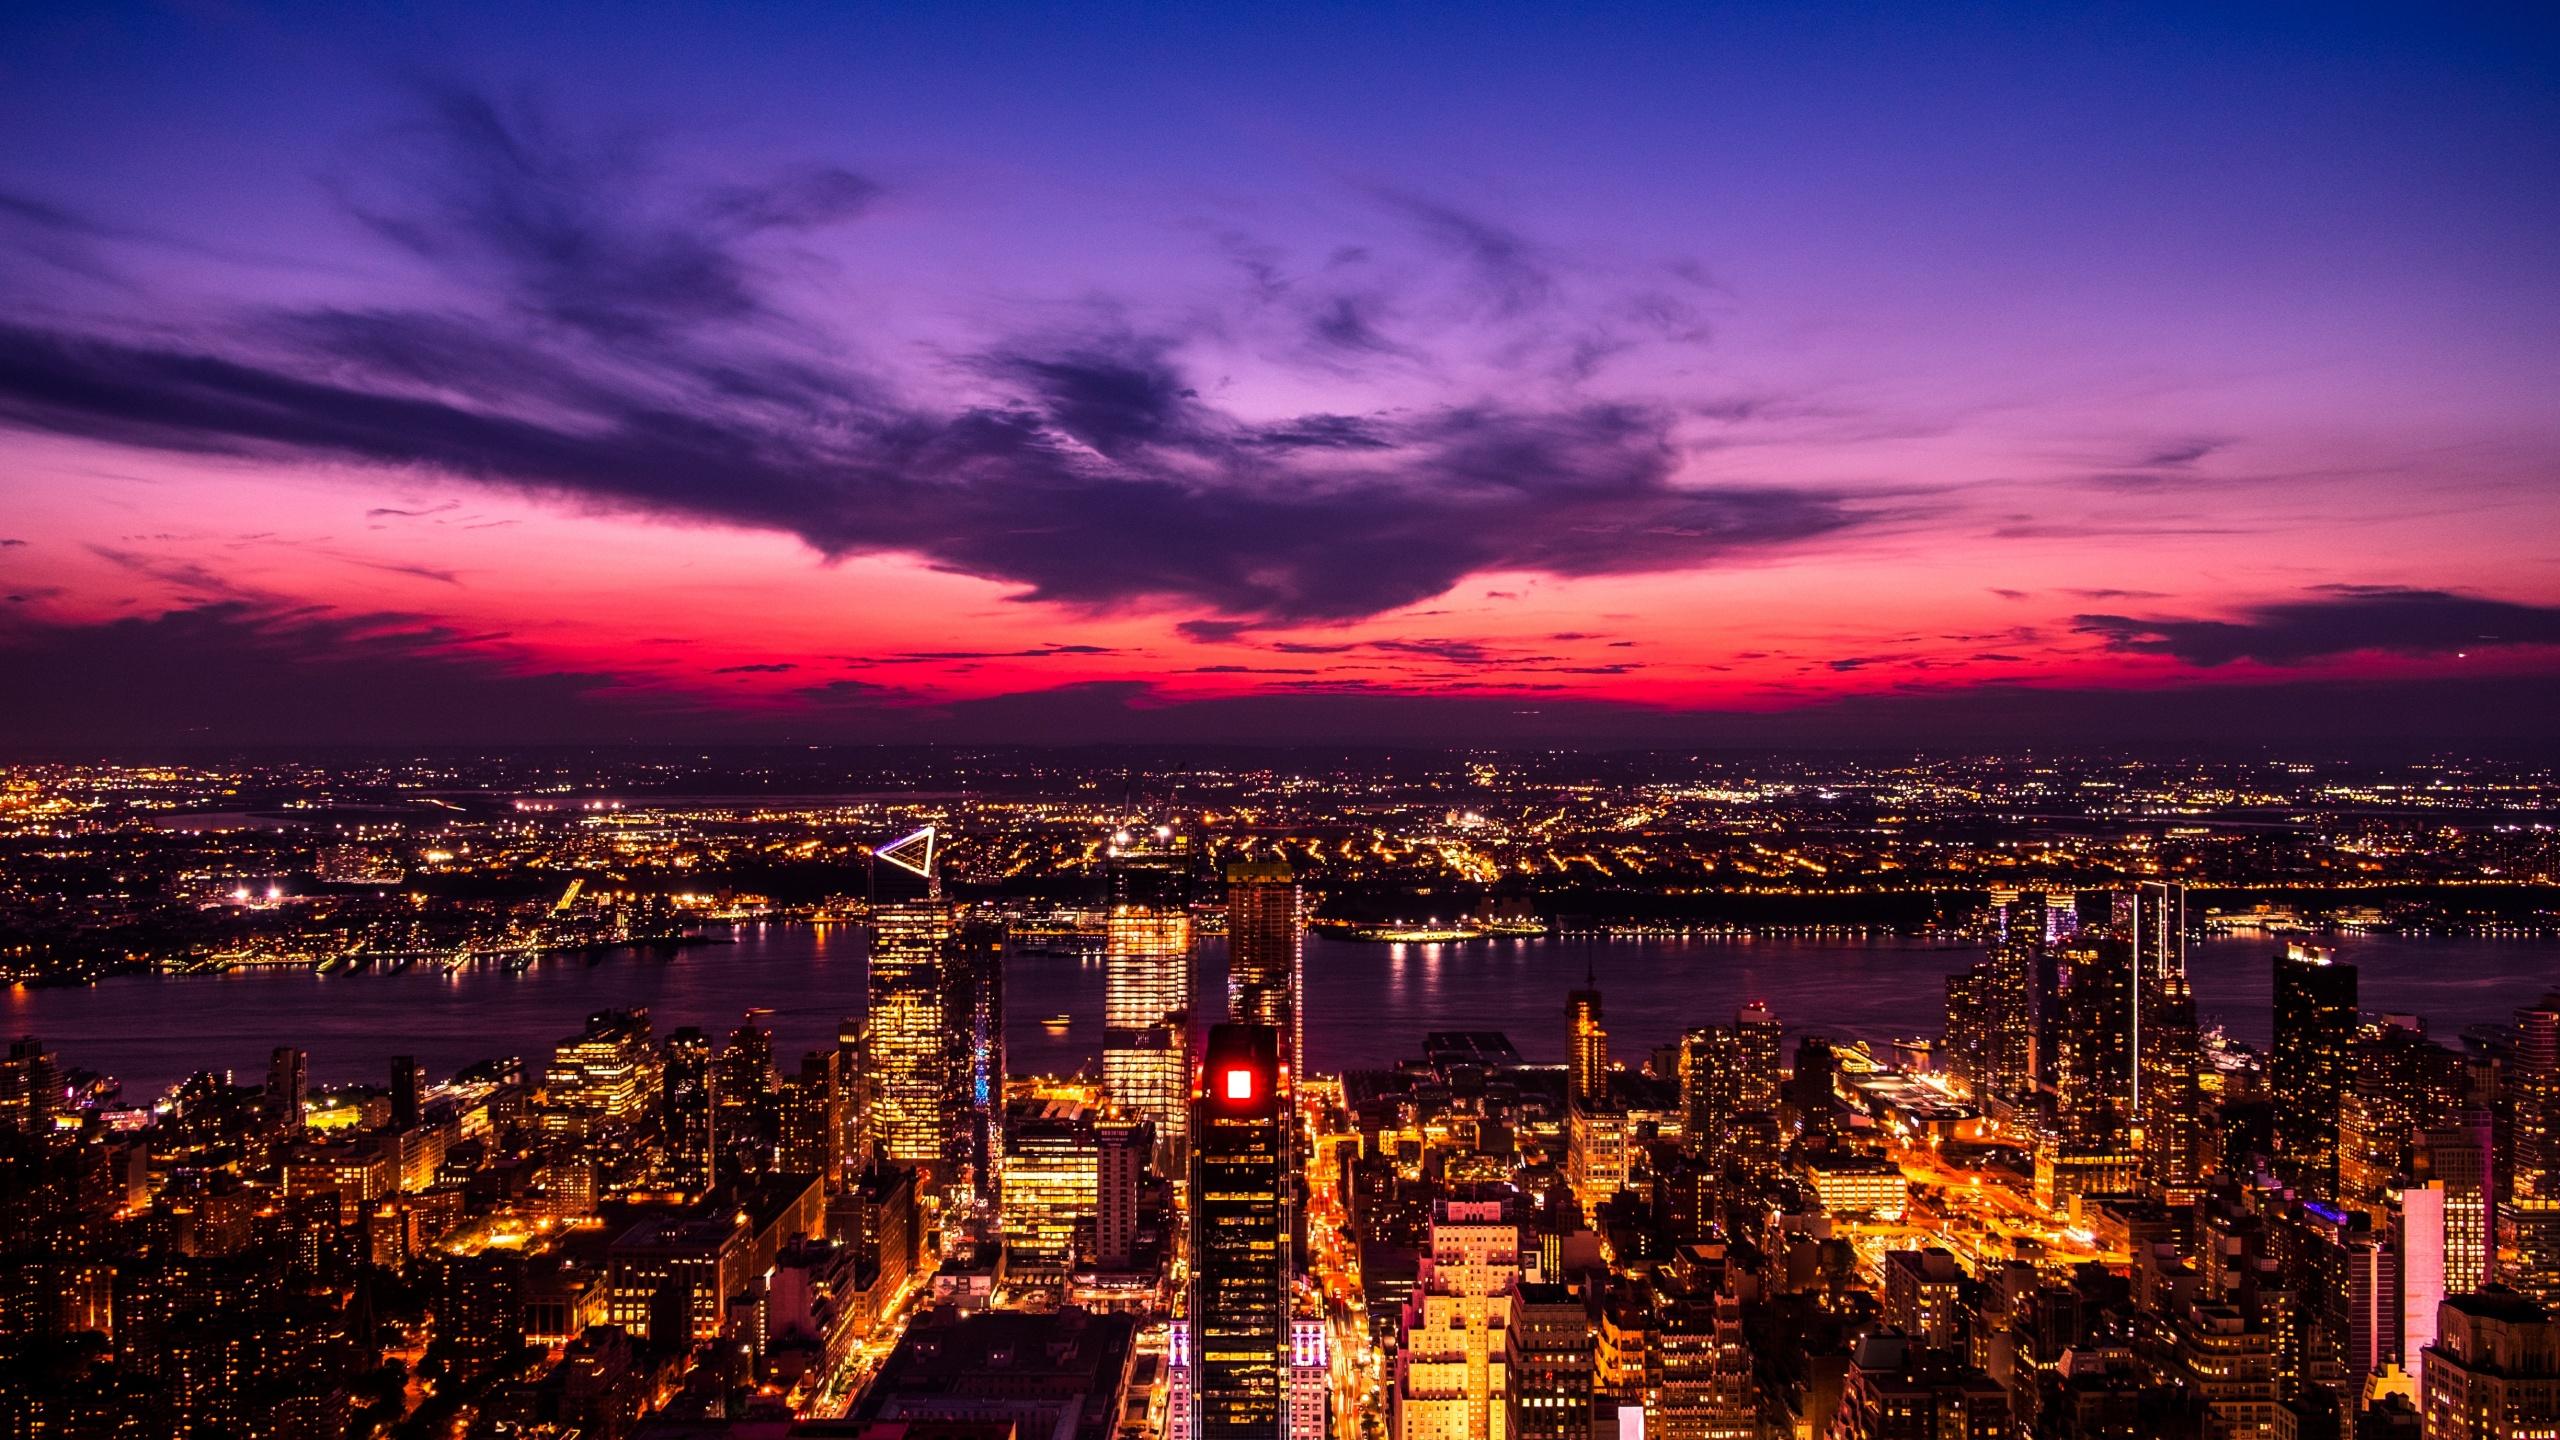 New York City 4k Wallpaper Twilight Sunset Cityscape City Lights 5k World 1543